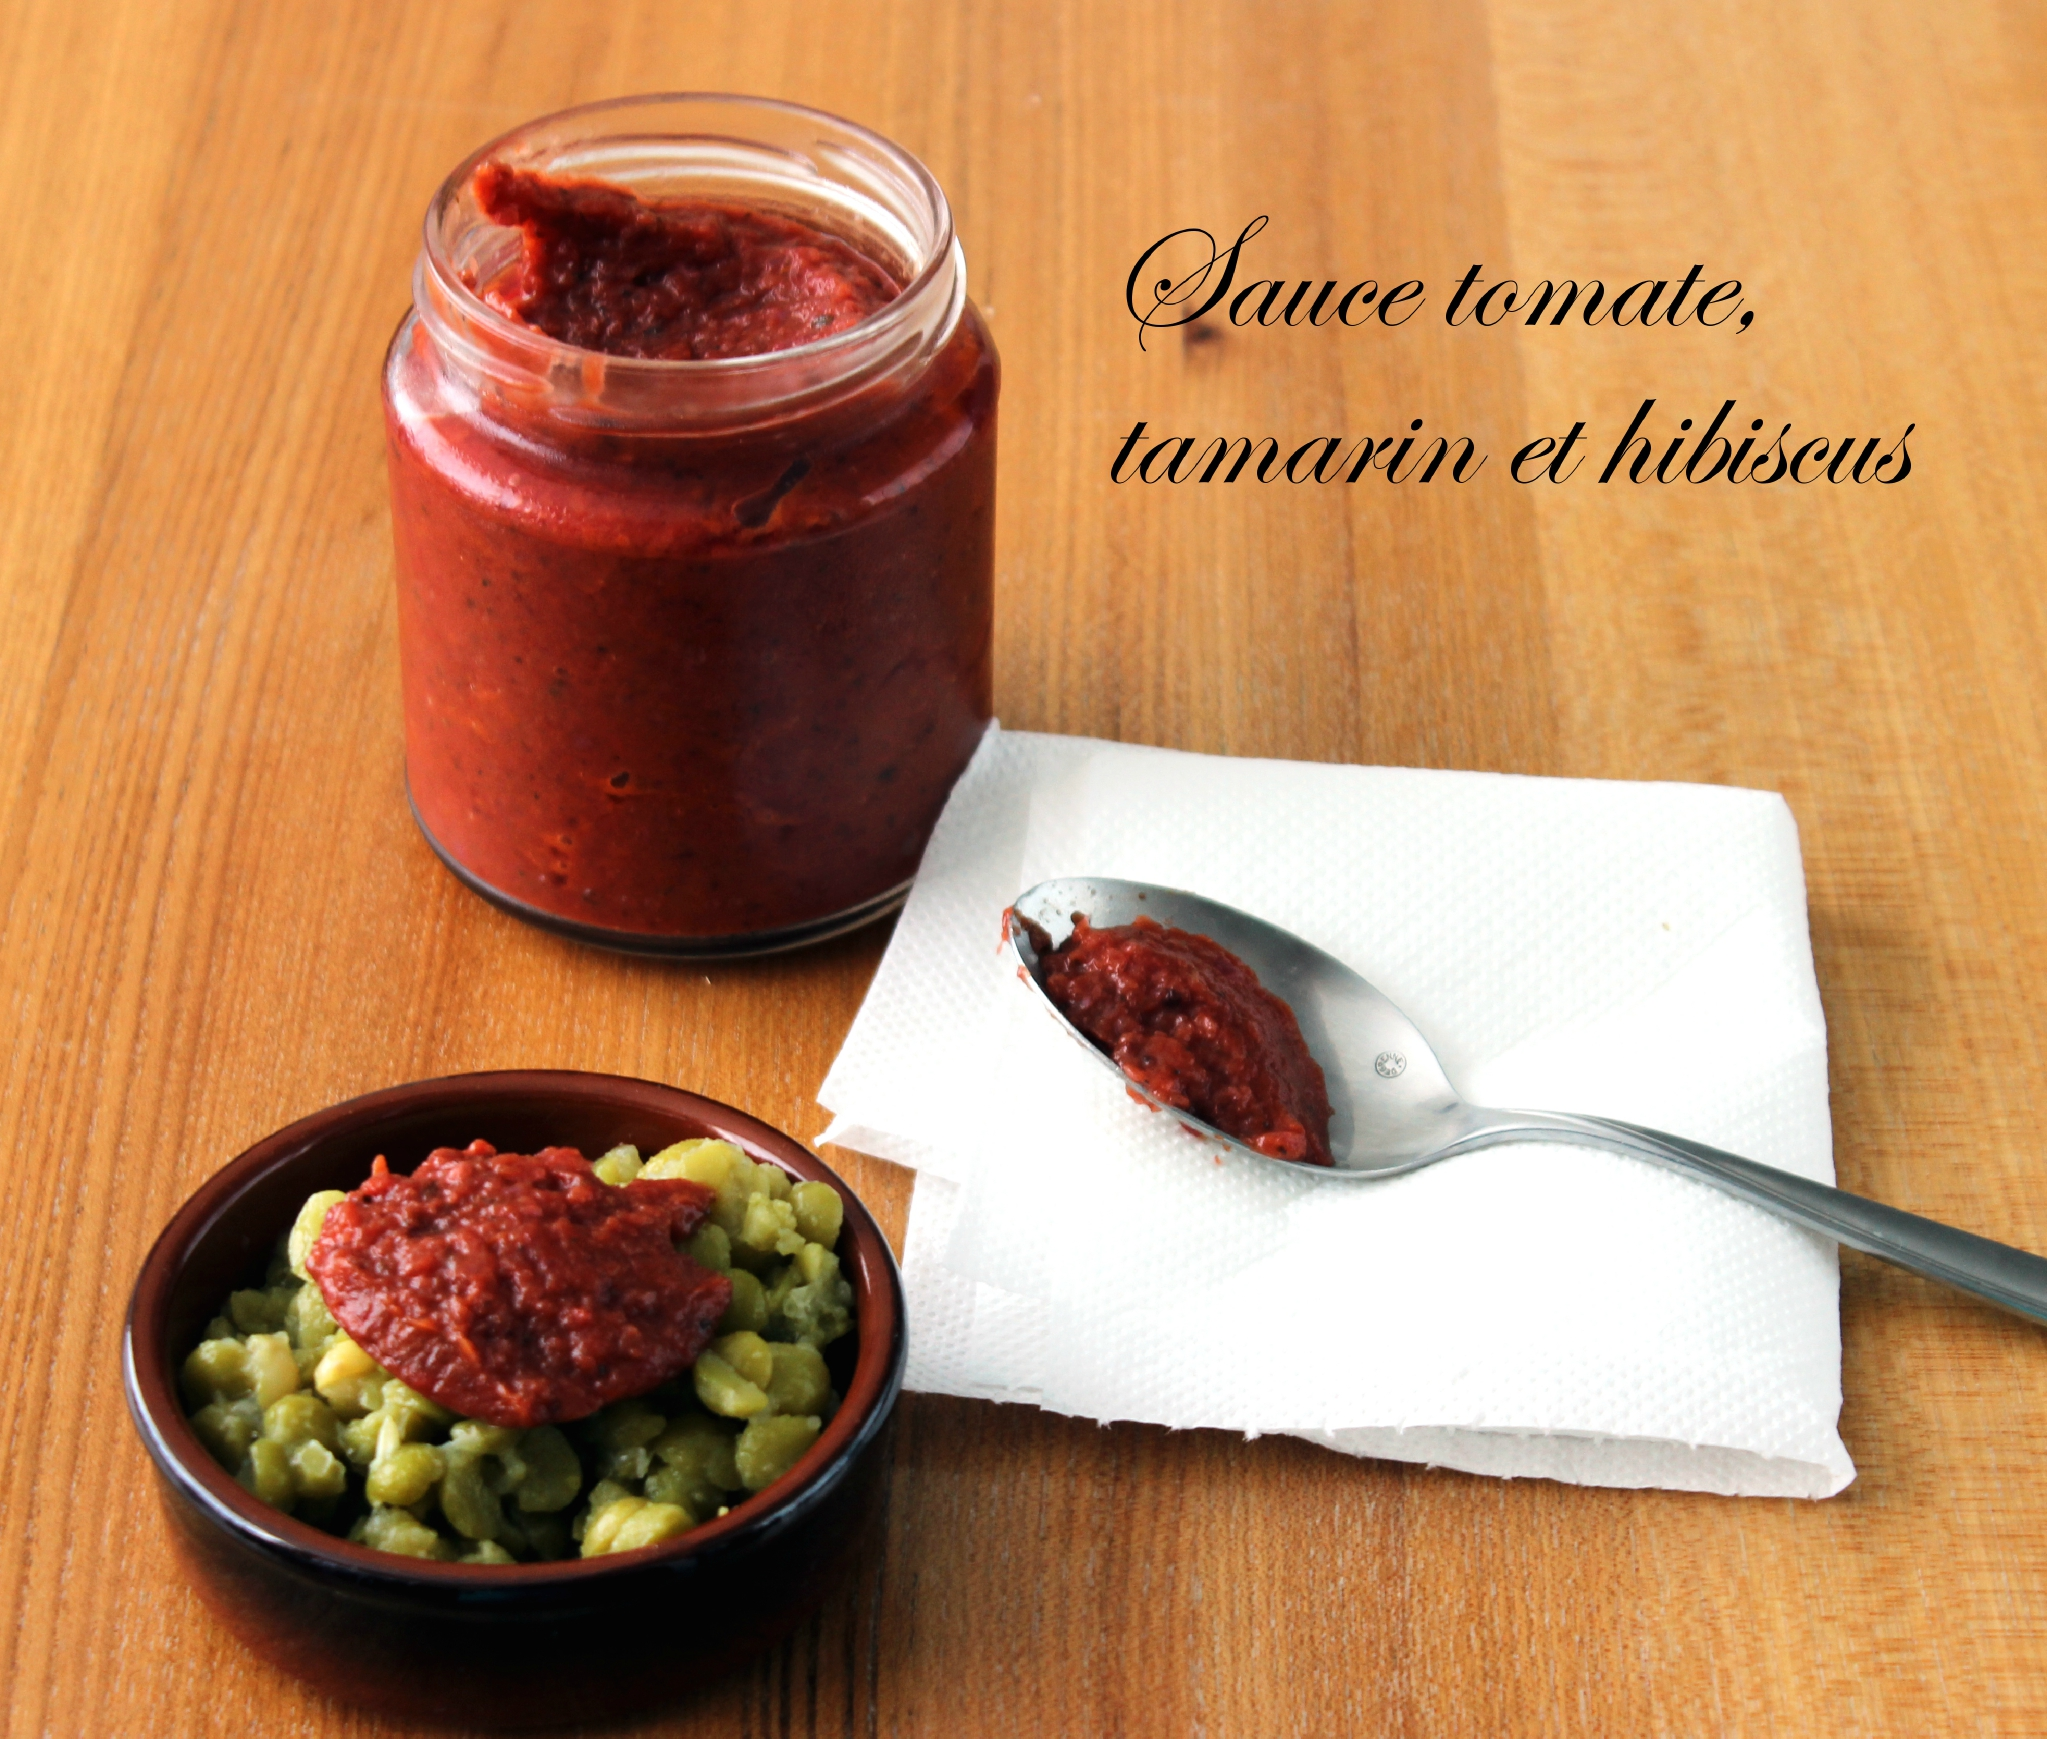 sauce-tamarin enceinte